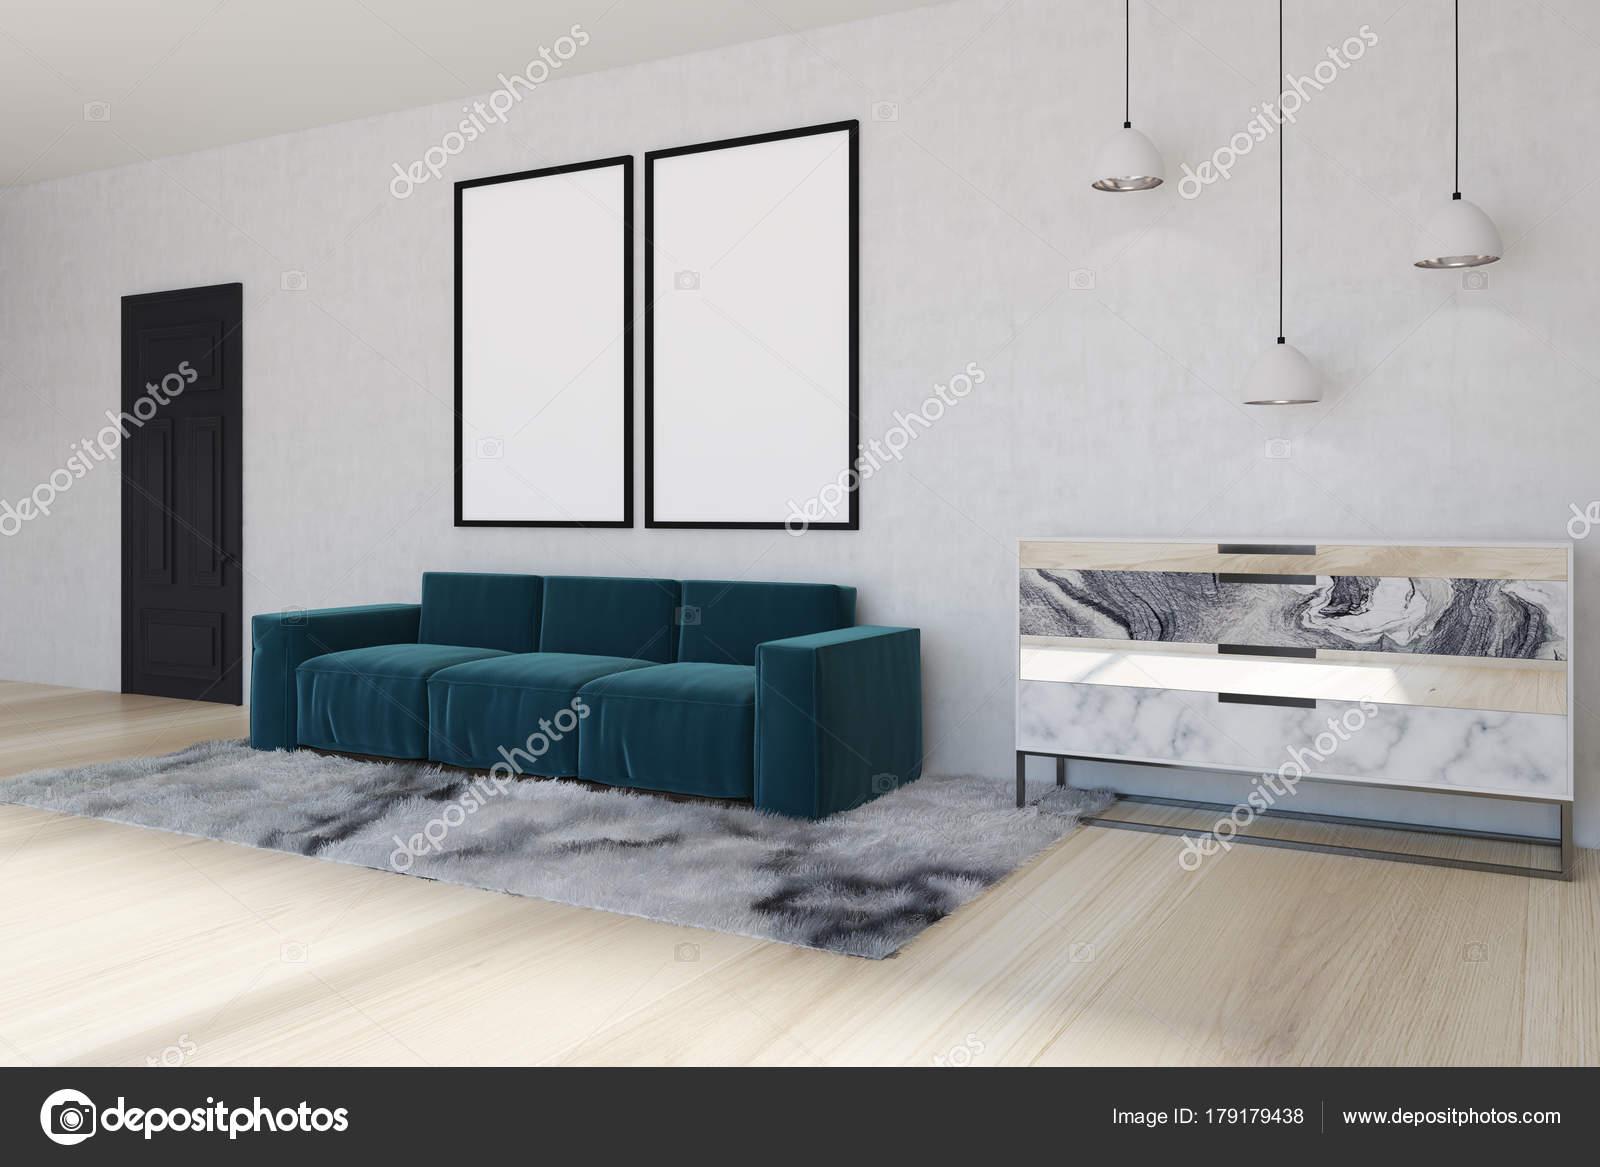 Spiegel woonkamer, blauwe hoekbank, kant — Stockfoto ...